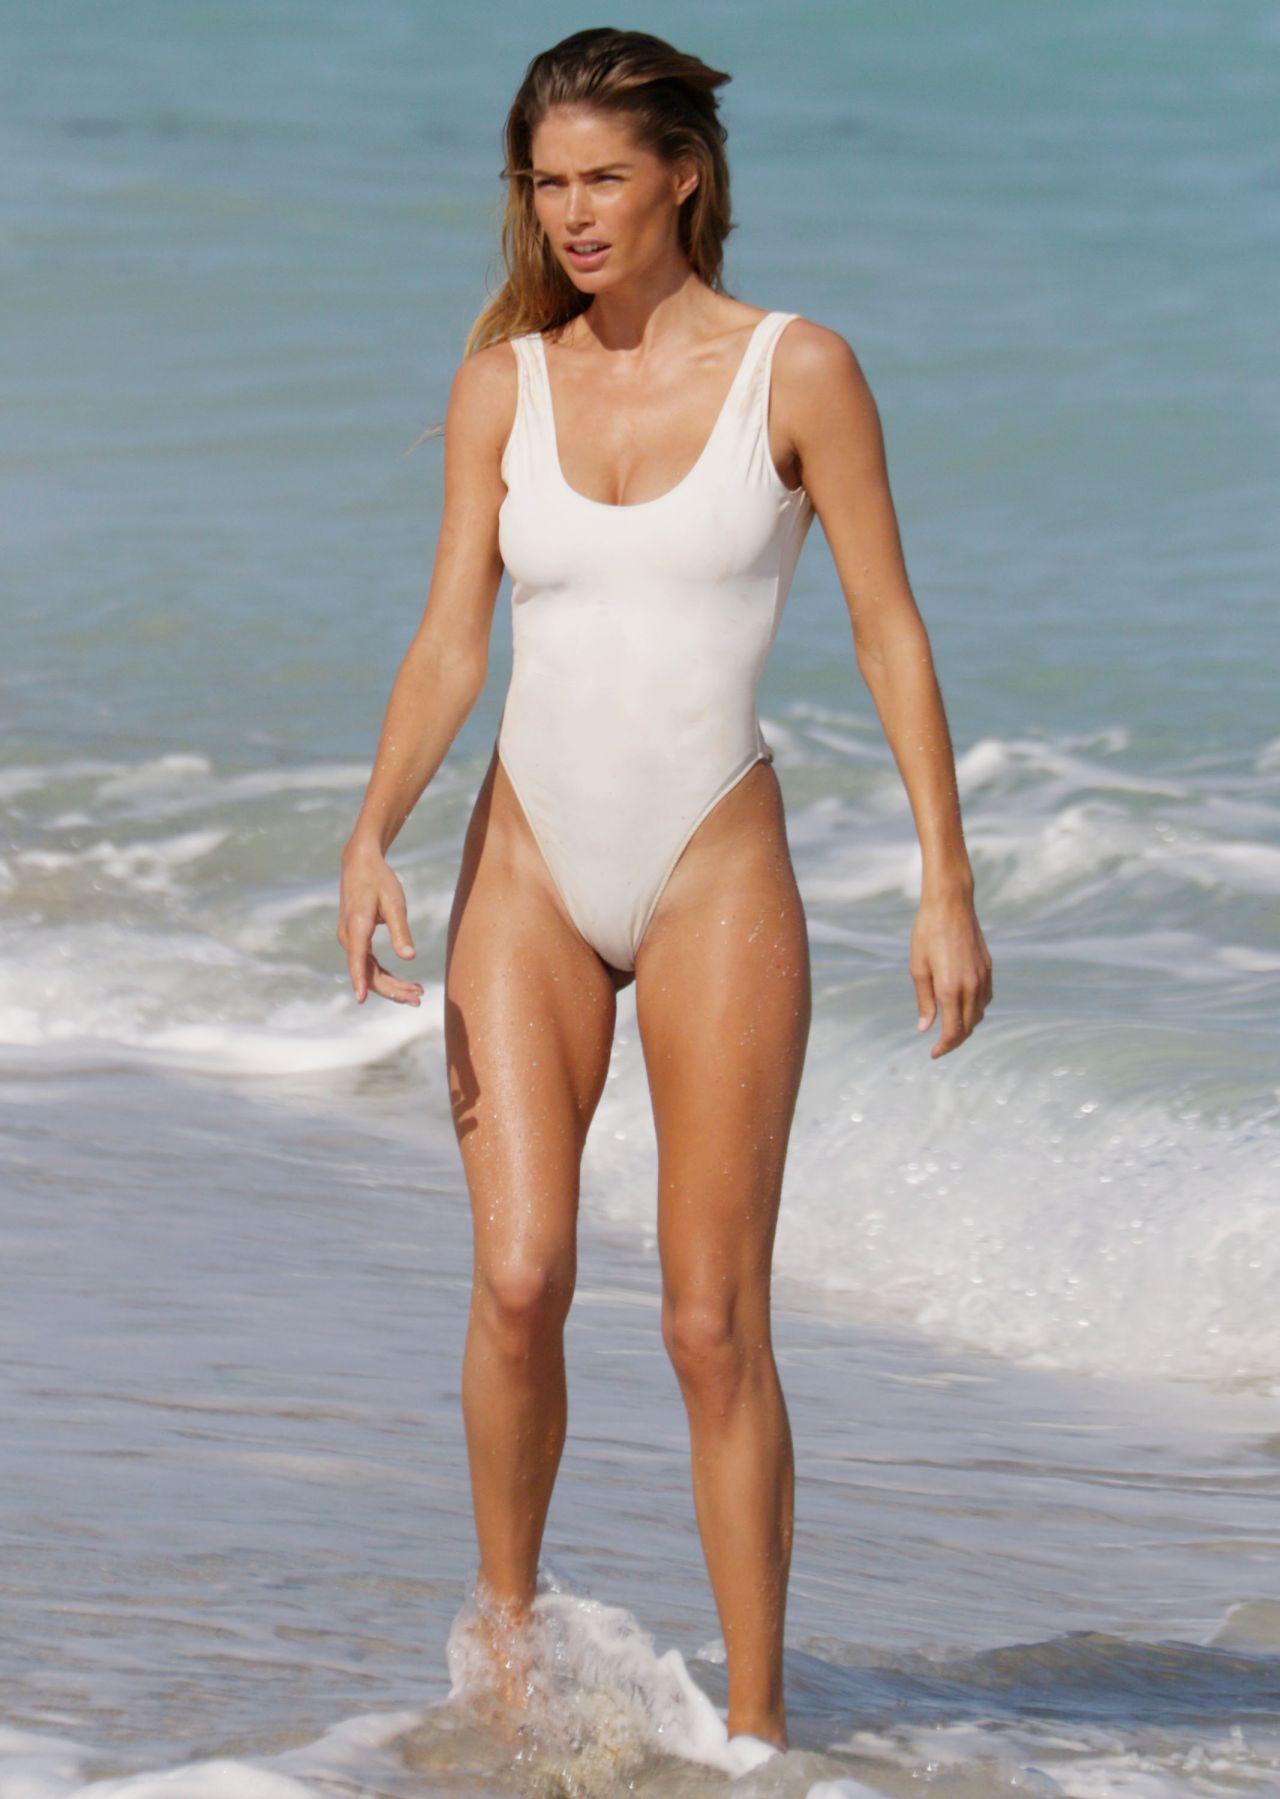 Doutzen Kroes Bikini Bodies Pic 1 of 35